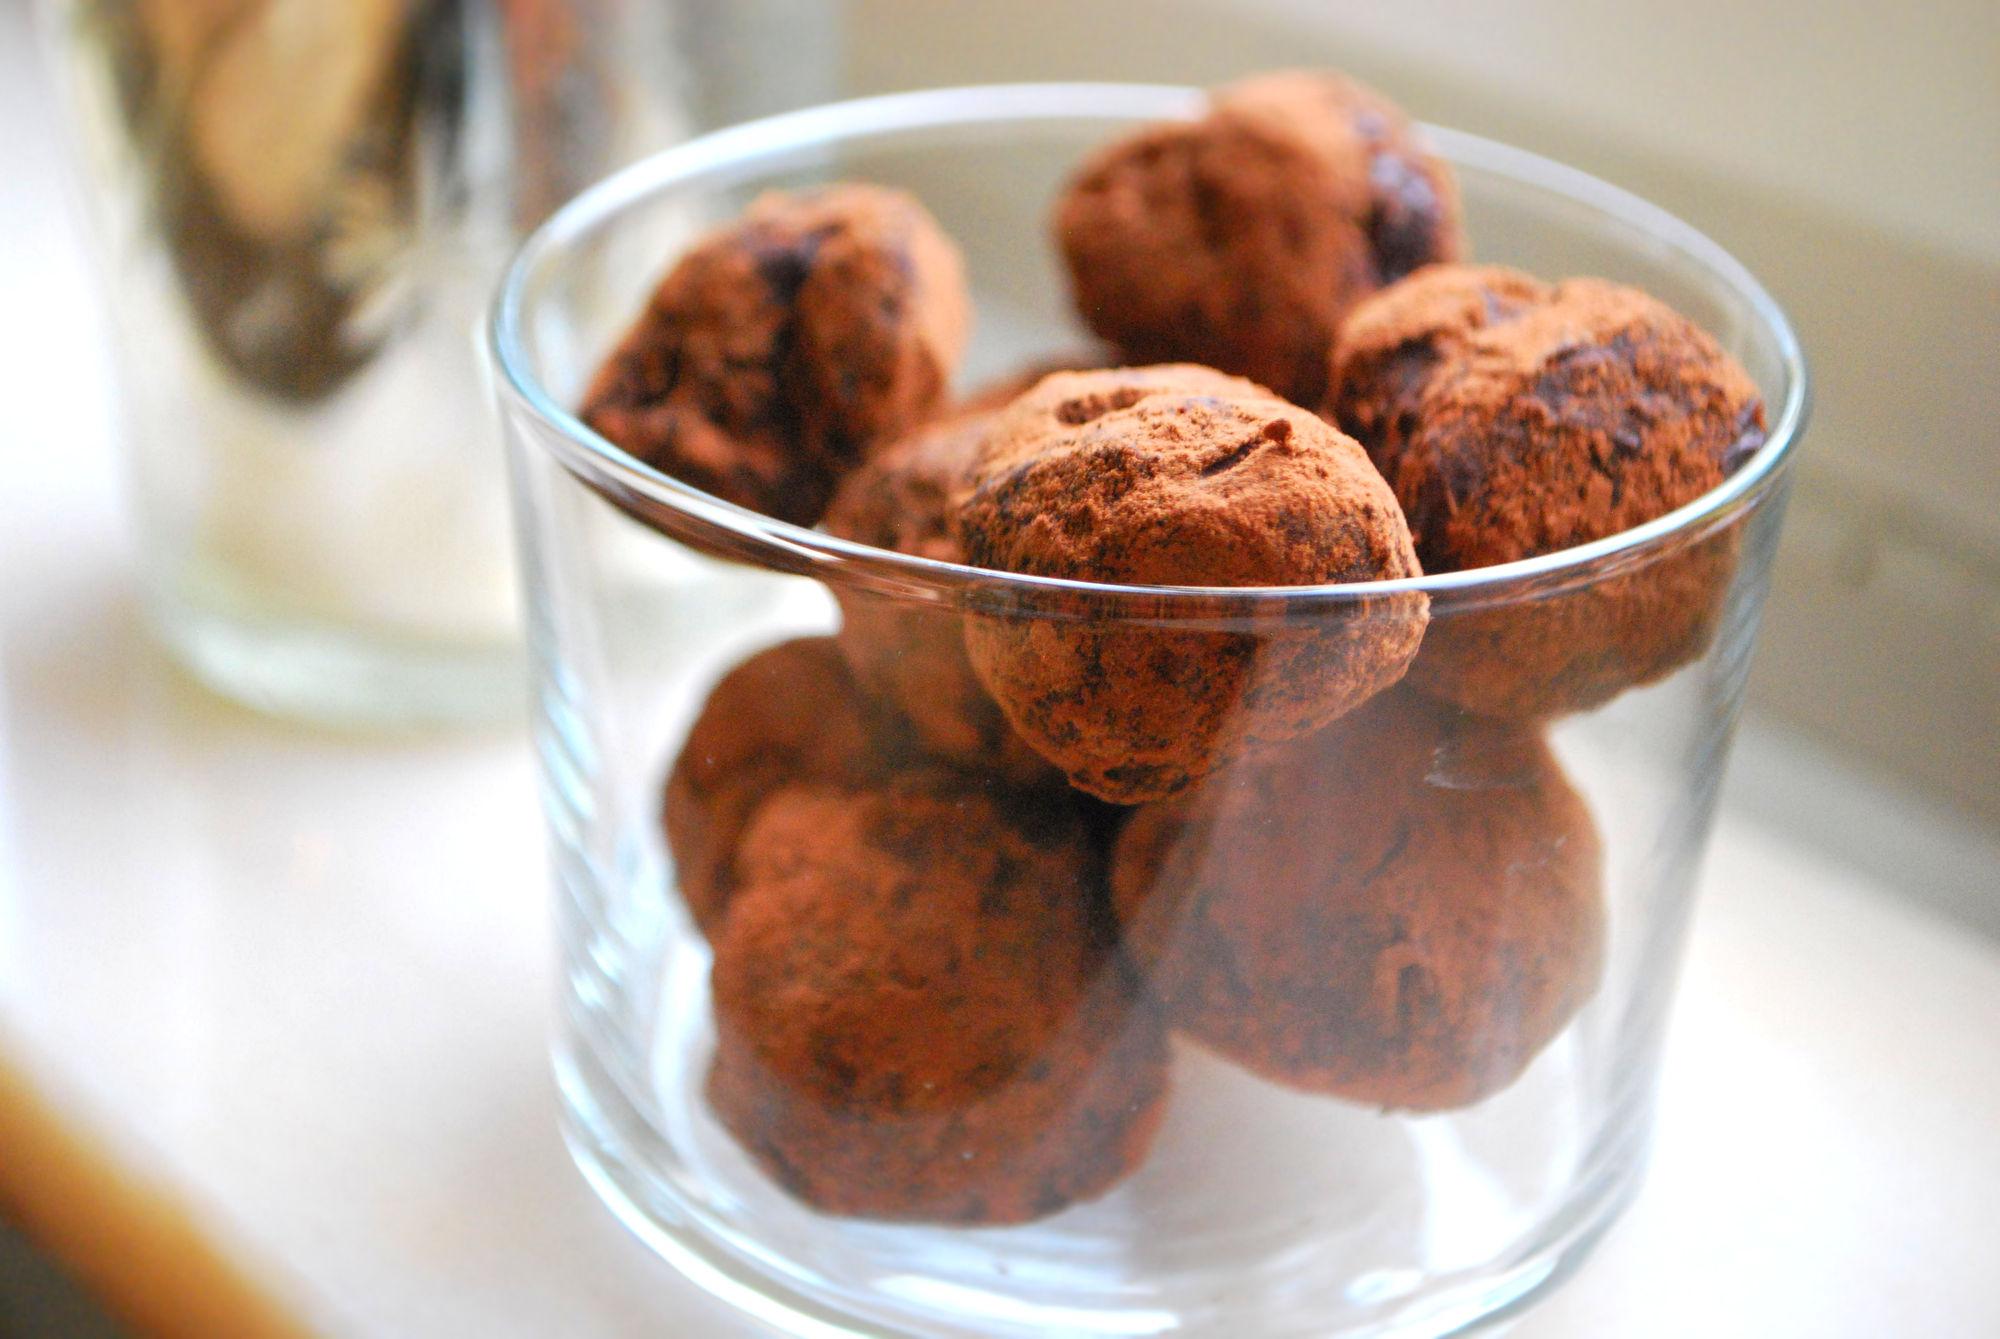 Den perfekta gåvan – Chokladtryfflar